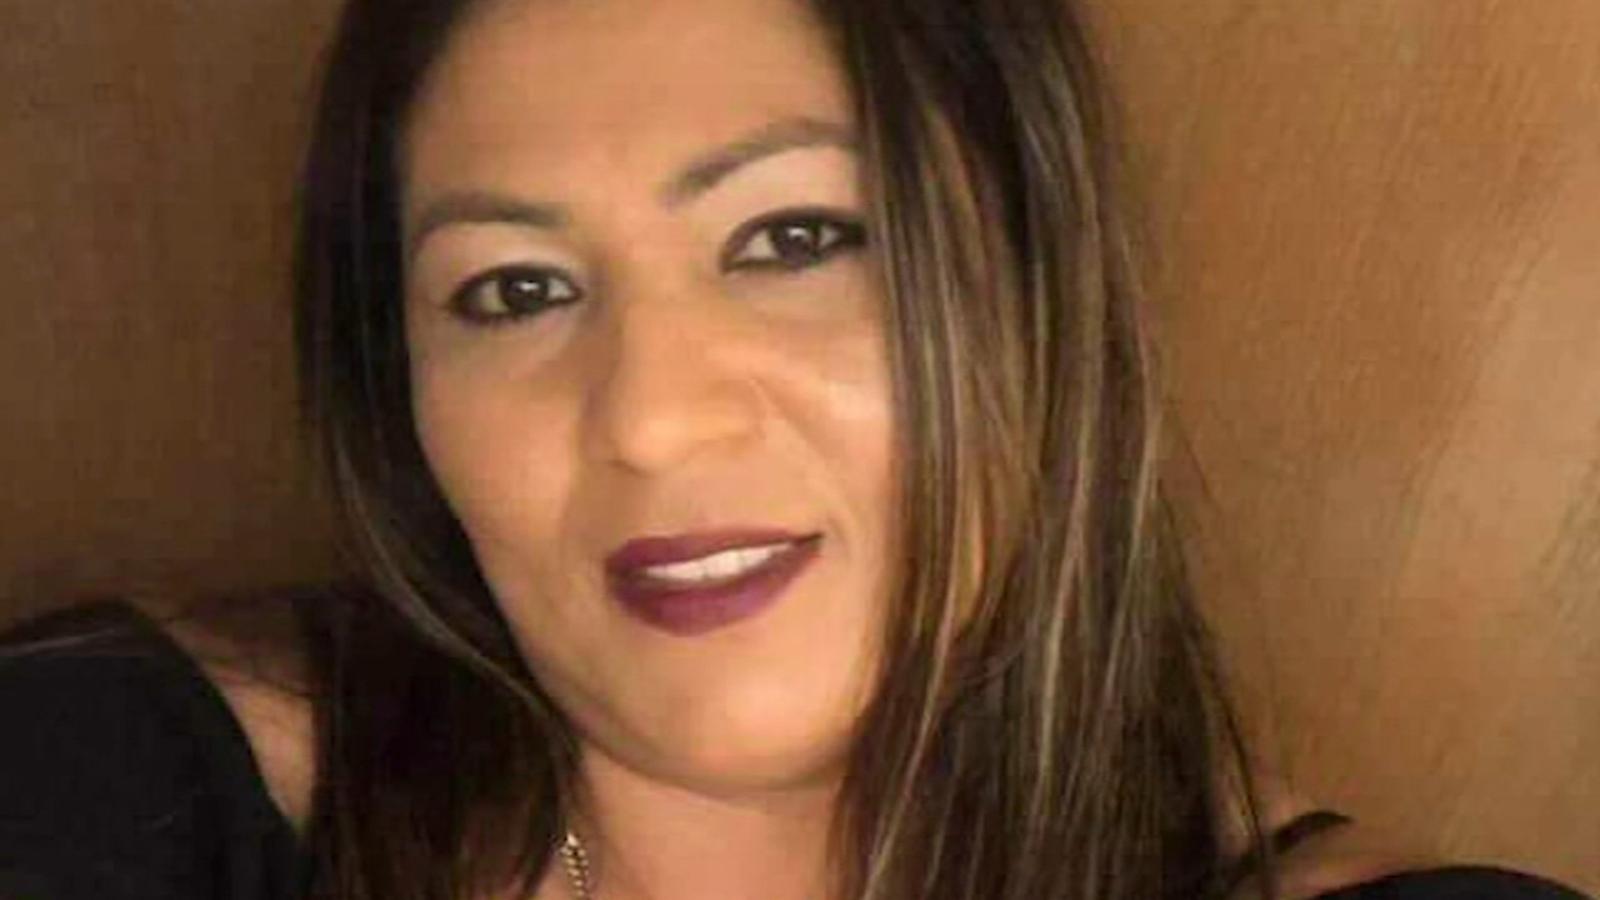 Man, expecting mom shot, killed at soccer tourney